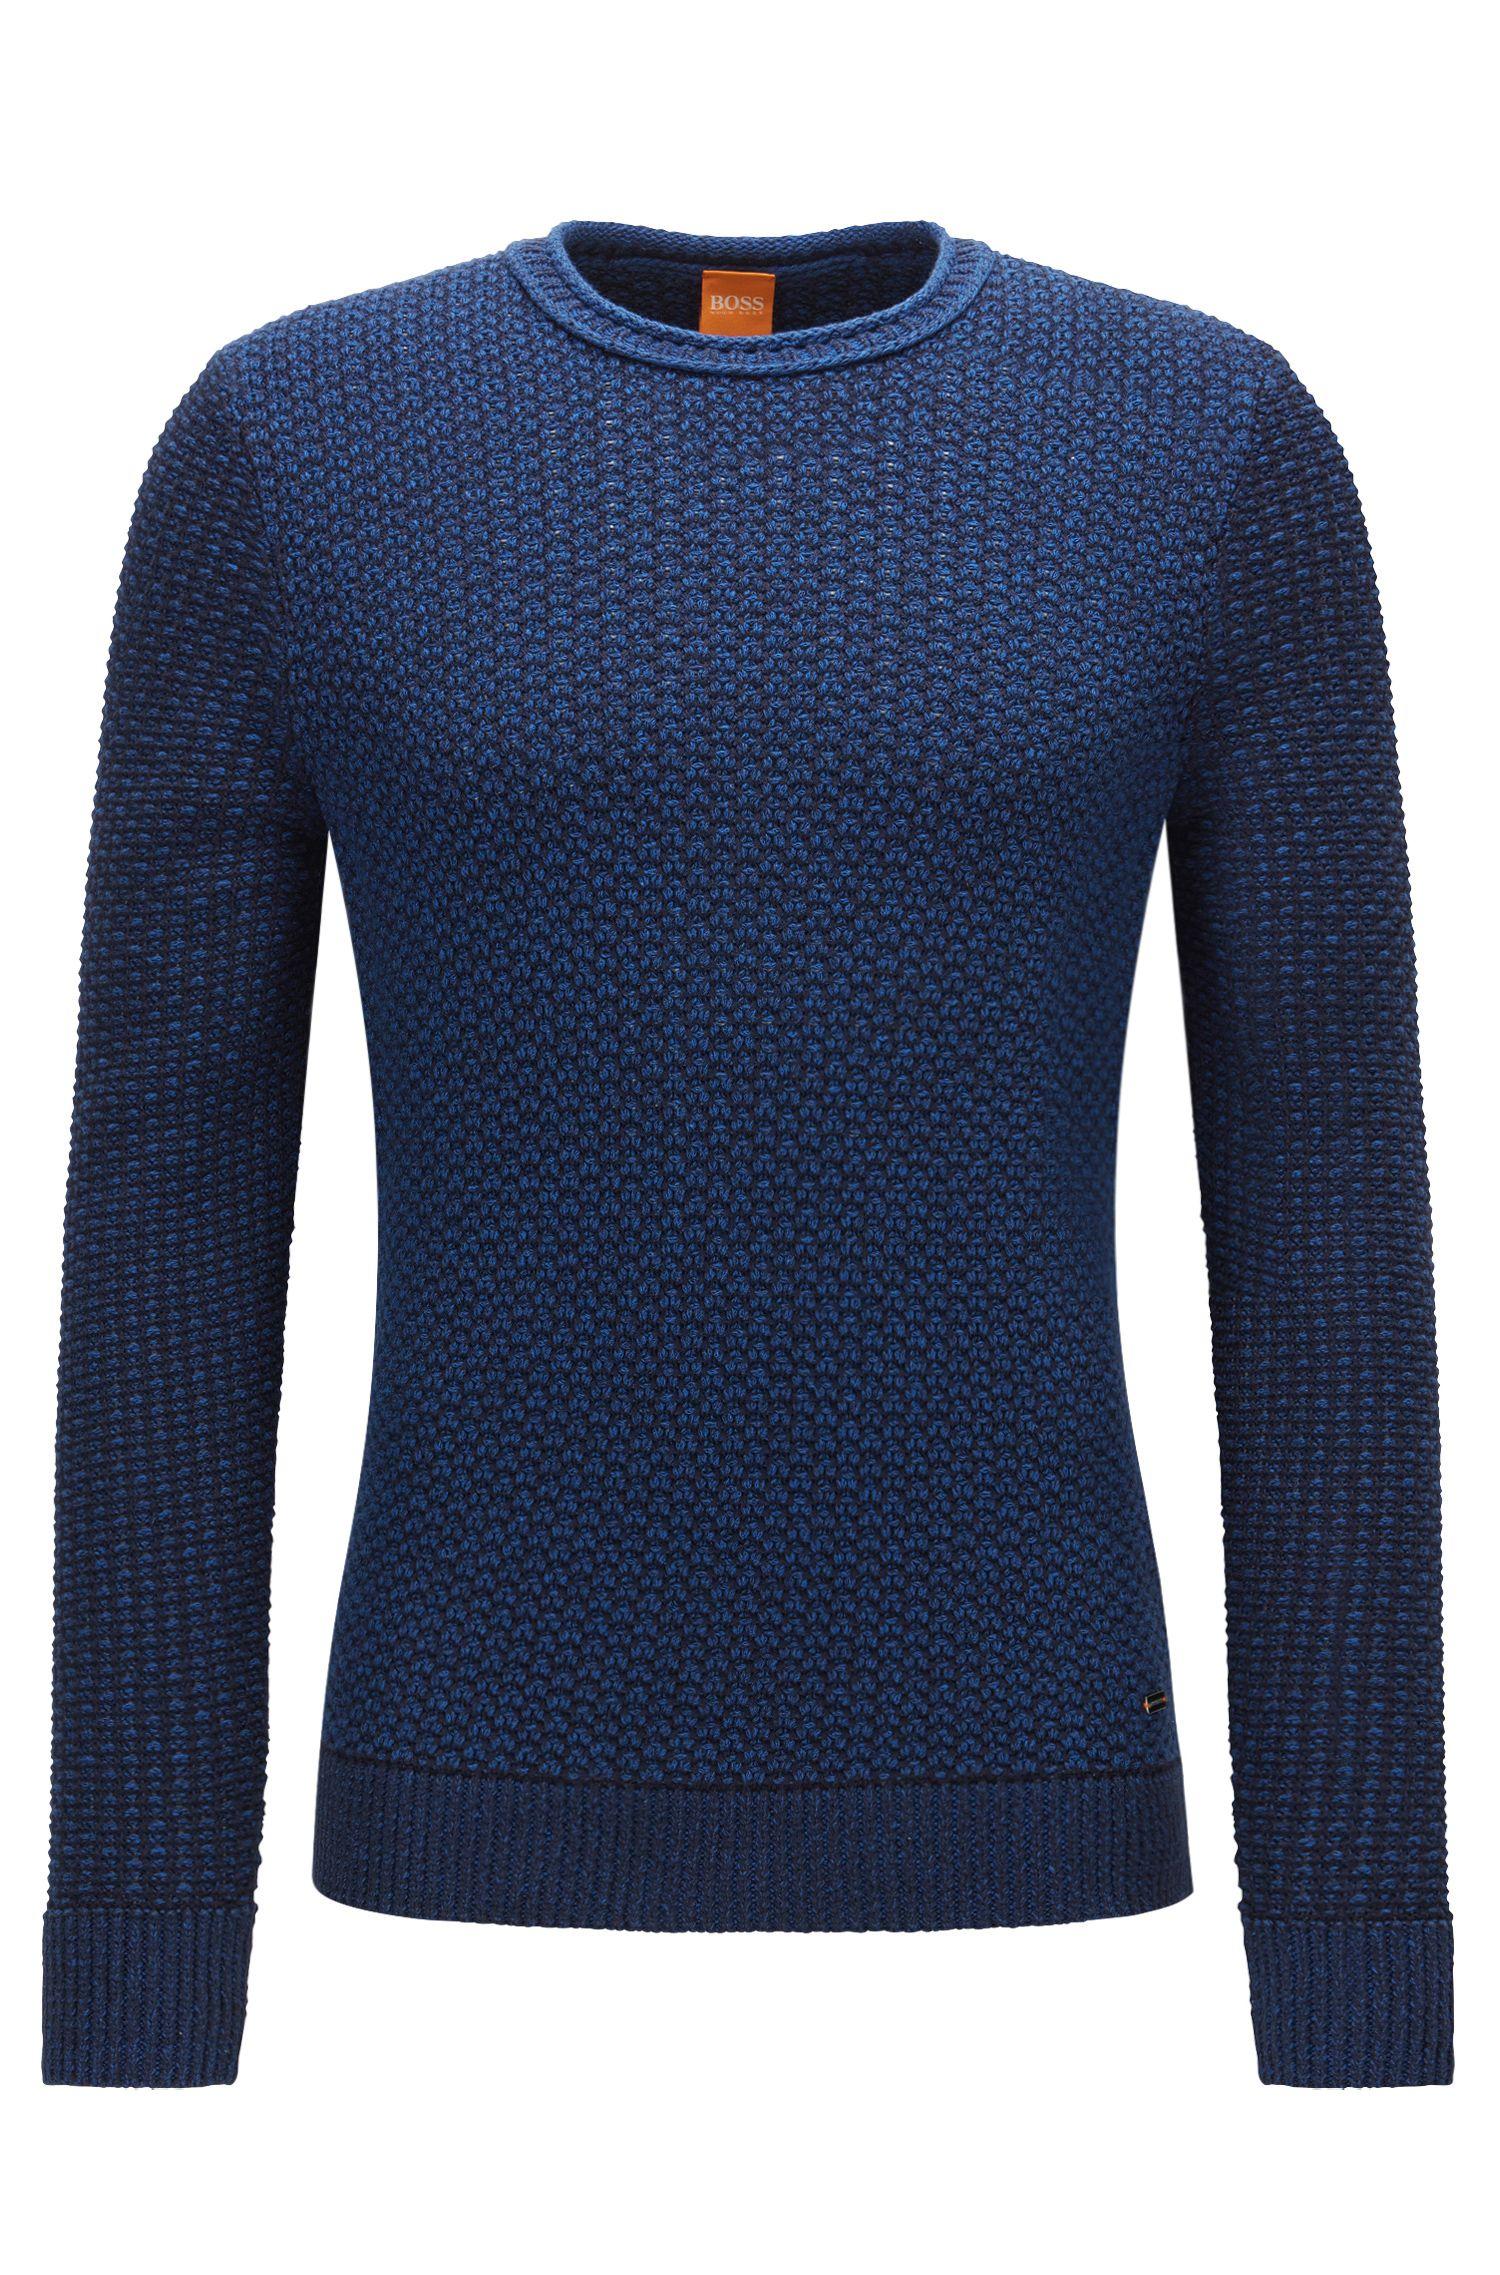 Dobby Cotton Sweater | Kindpaul